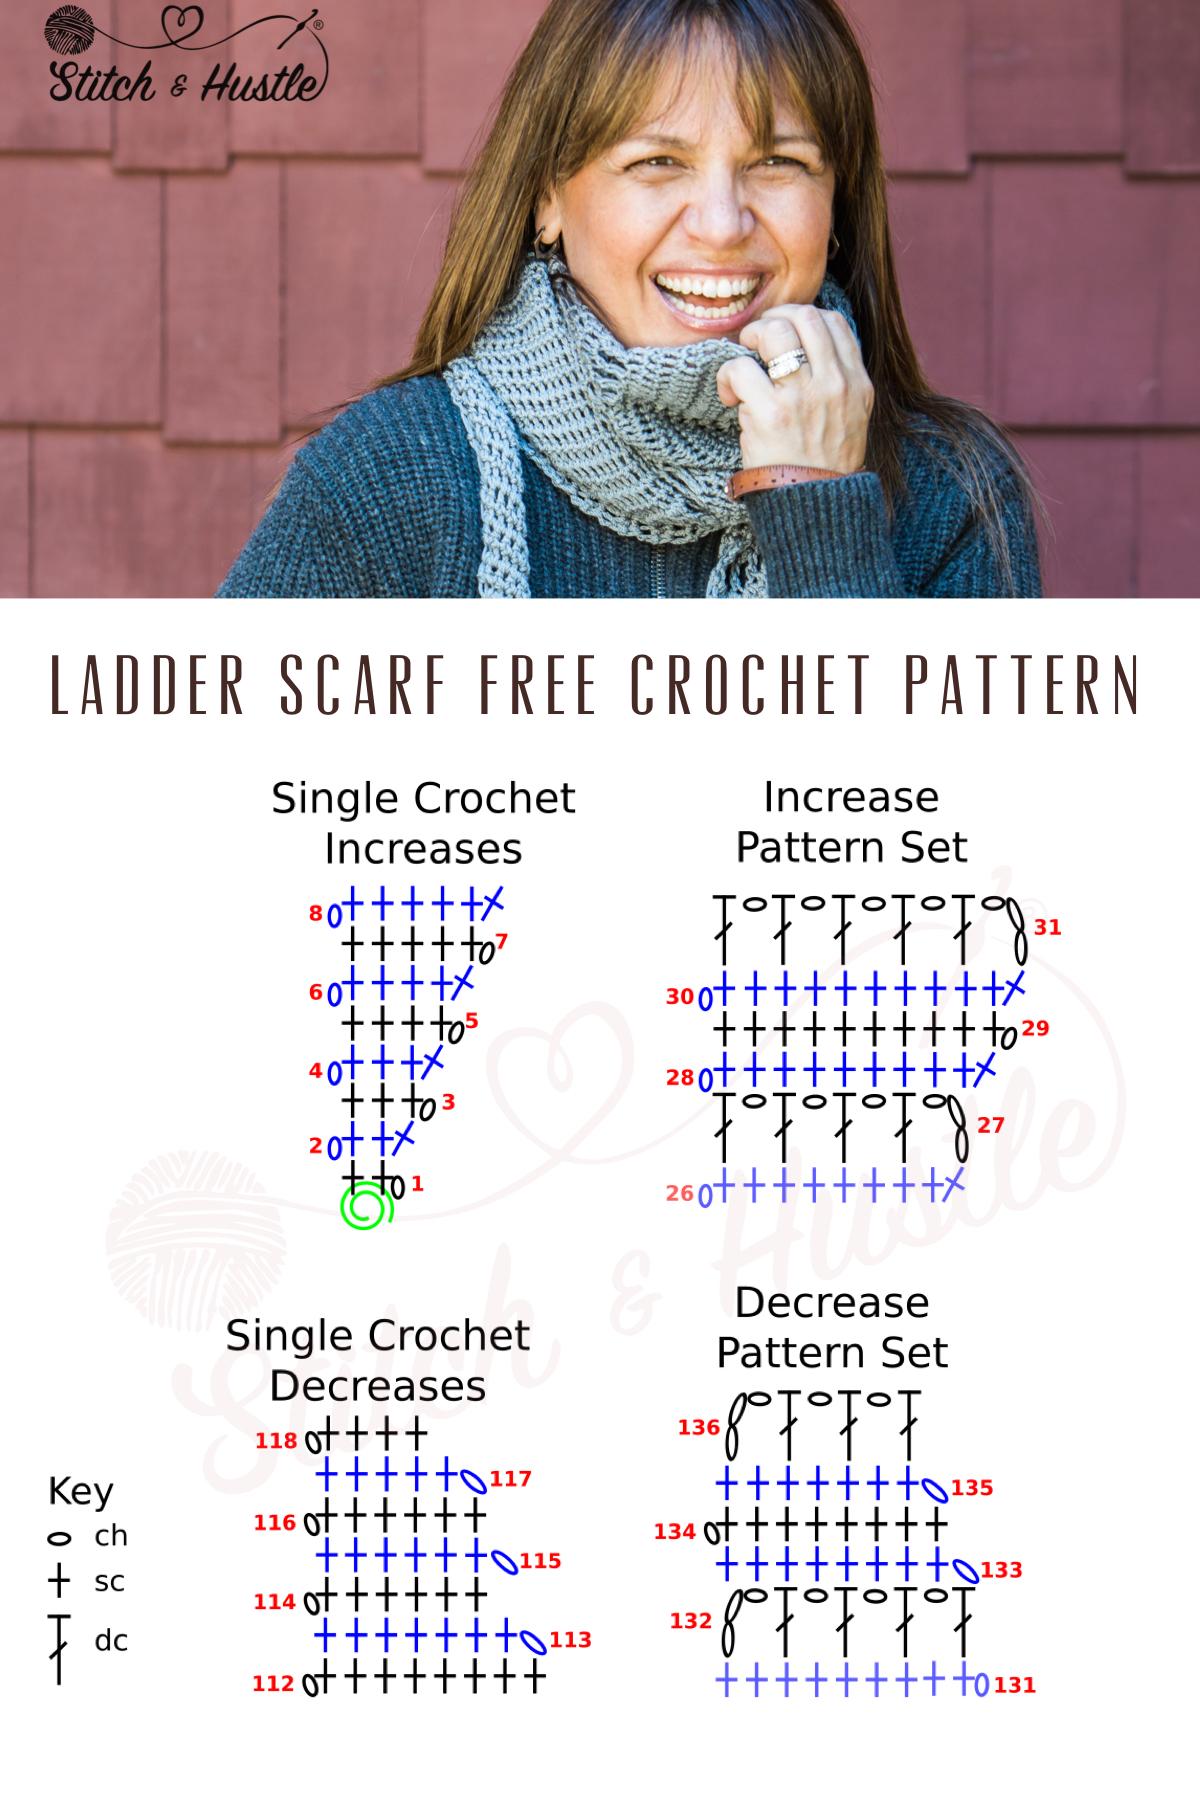 crochet_ladder_scarf_free_pattern_12.jpg